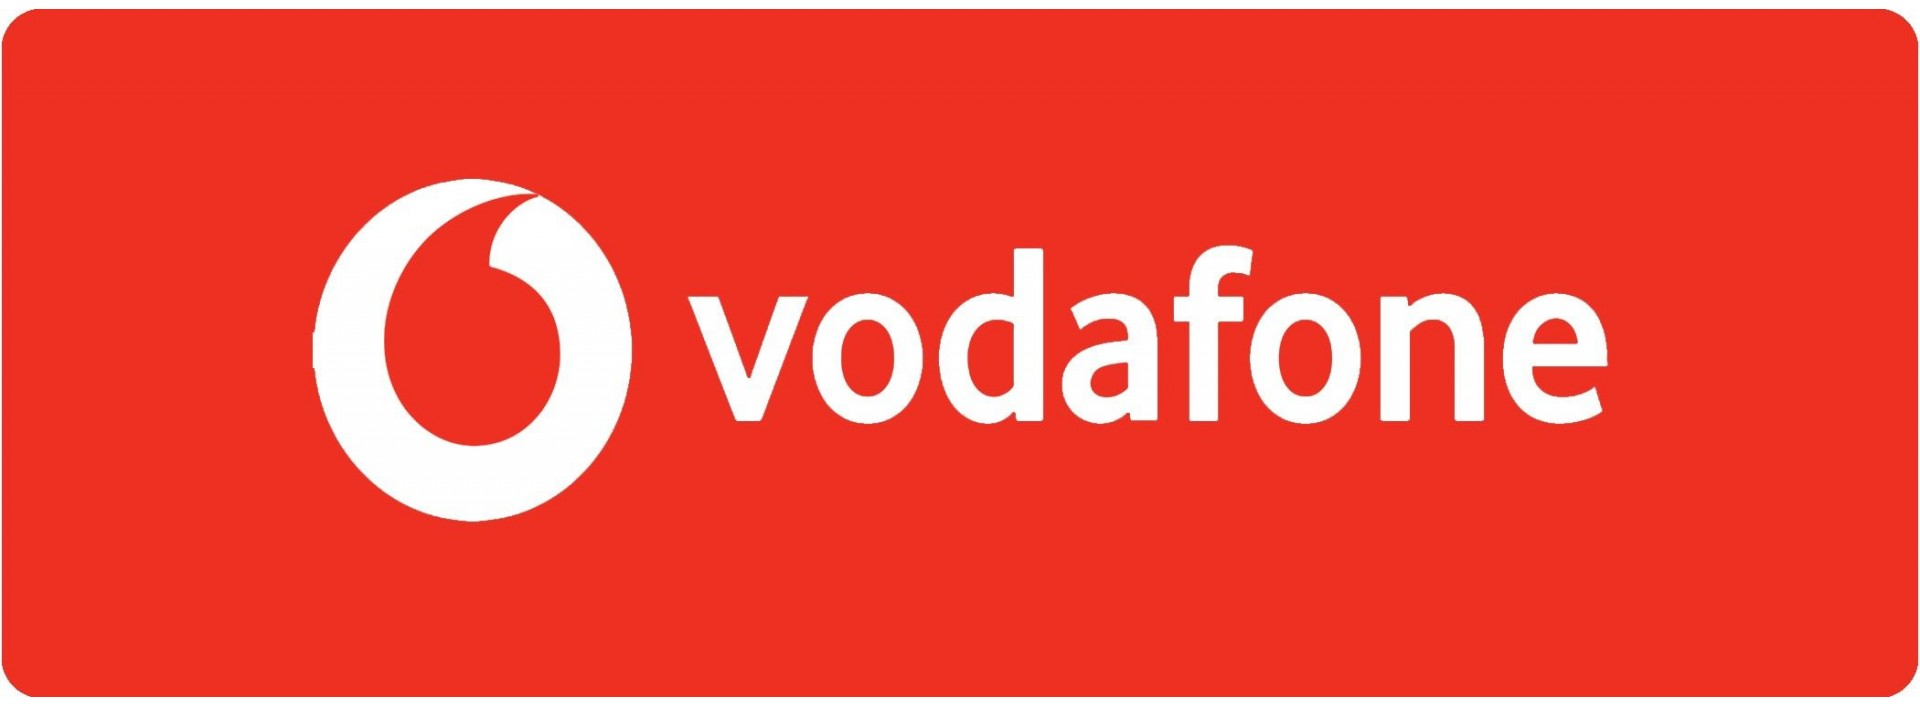 Fundas para Vodafone